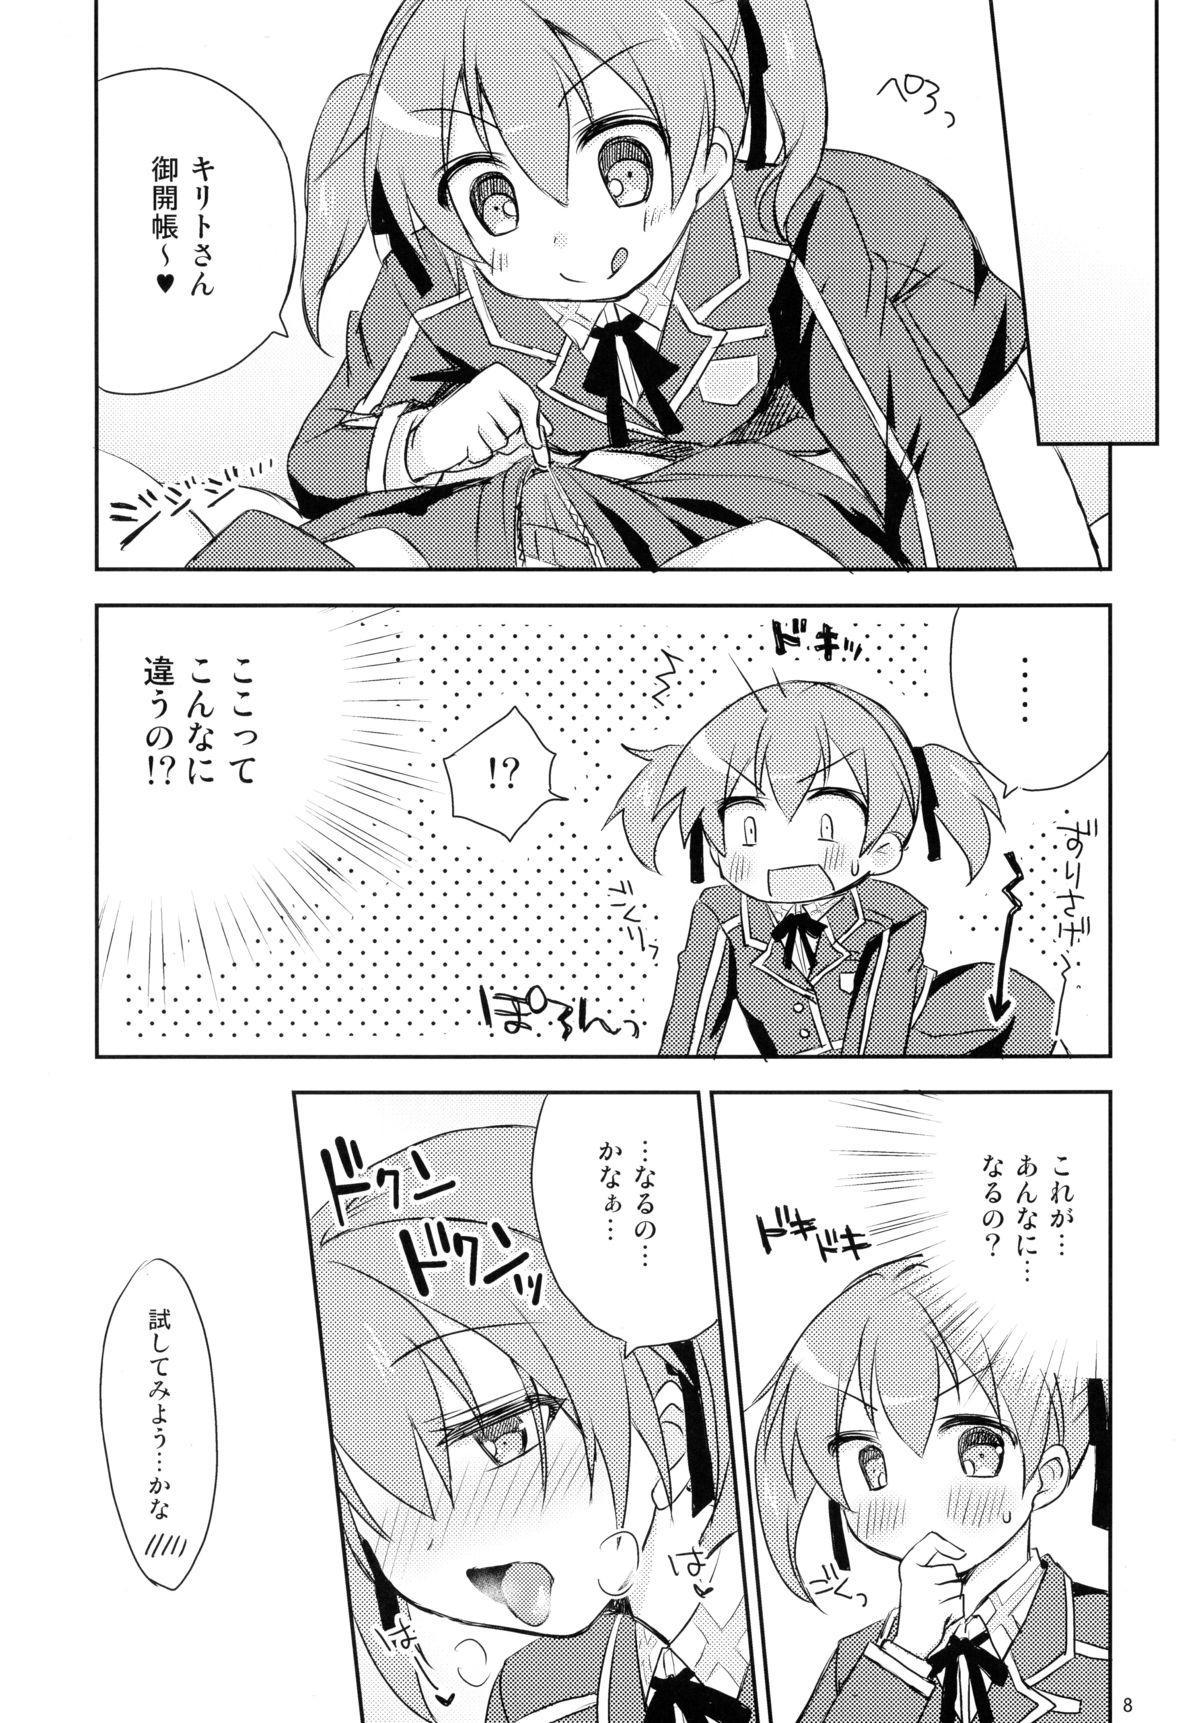 Itazura Silica-chan 7